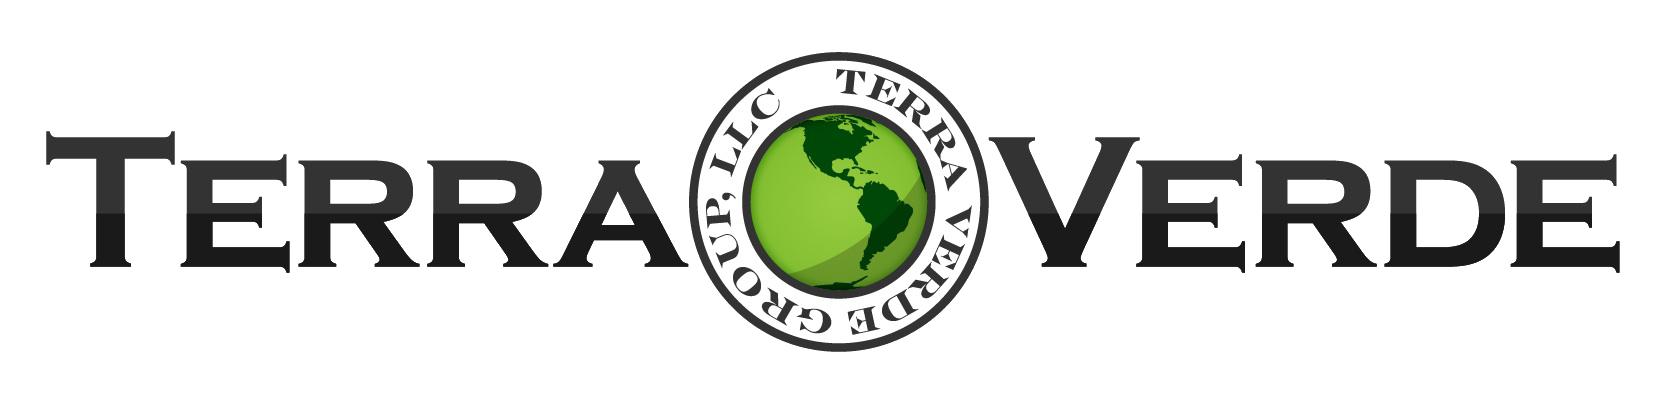 16_HPC_TerraVerdeLogo_PNG.png